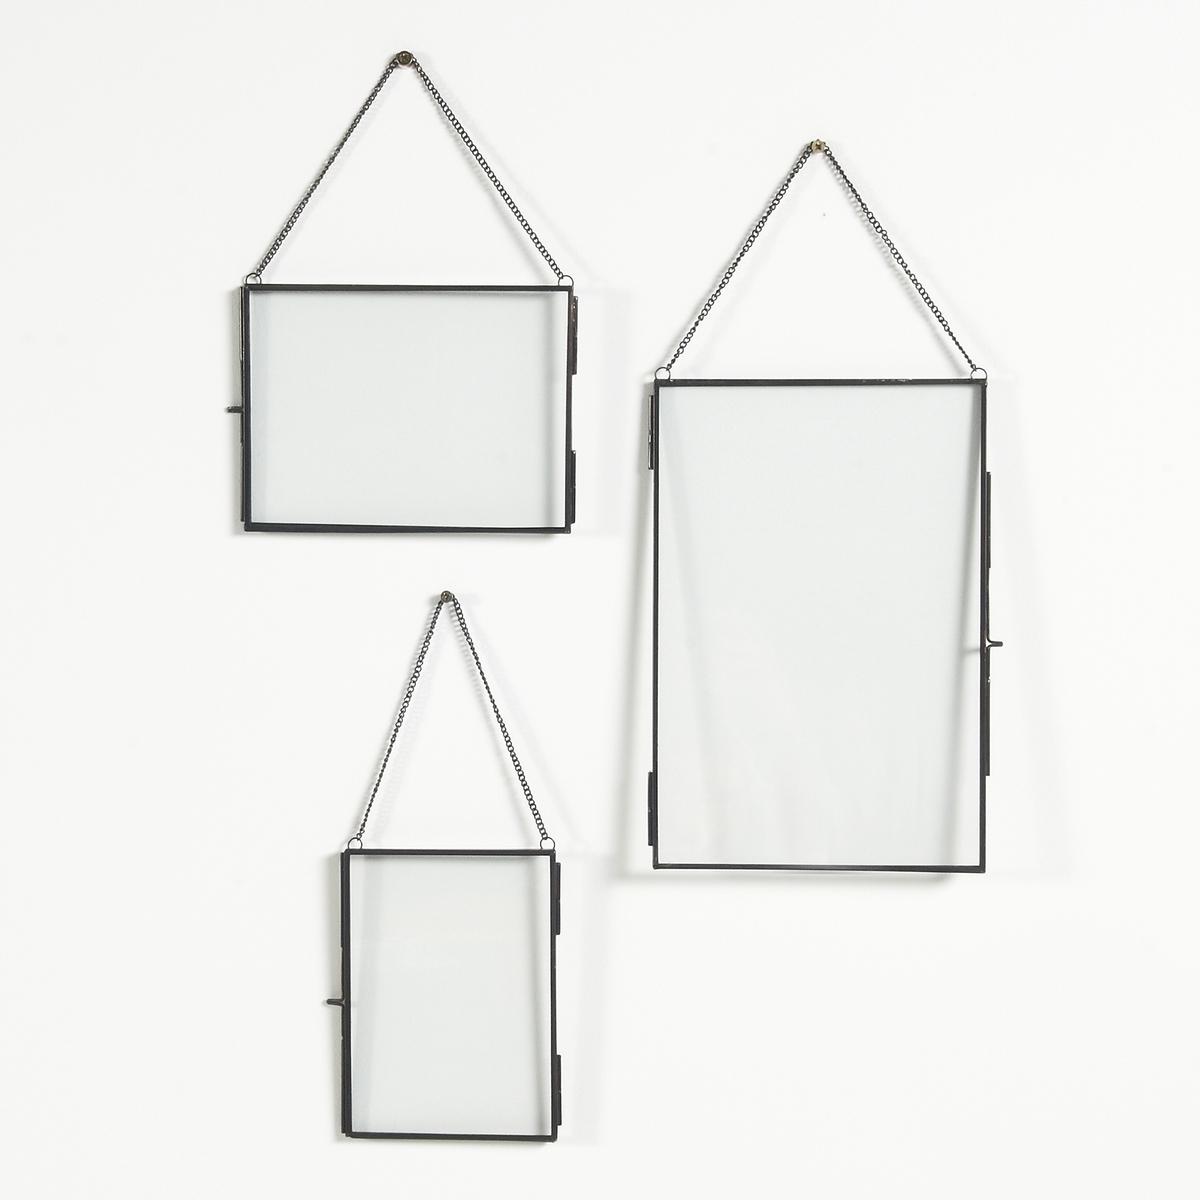 3 рамки из металла UyovaХарактеристики металлической рамки на стену UyovaКрепится на стенуИз металла с отделкой под латунь Размеры металлической рамки Uyova21 x 15,5 см13,5 x 18,5 см20,5 x 30,5 см<br><br>Цвет: черный